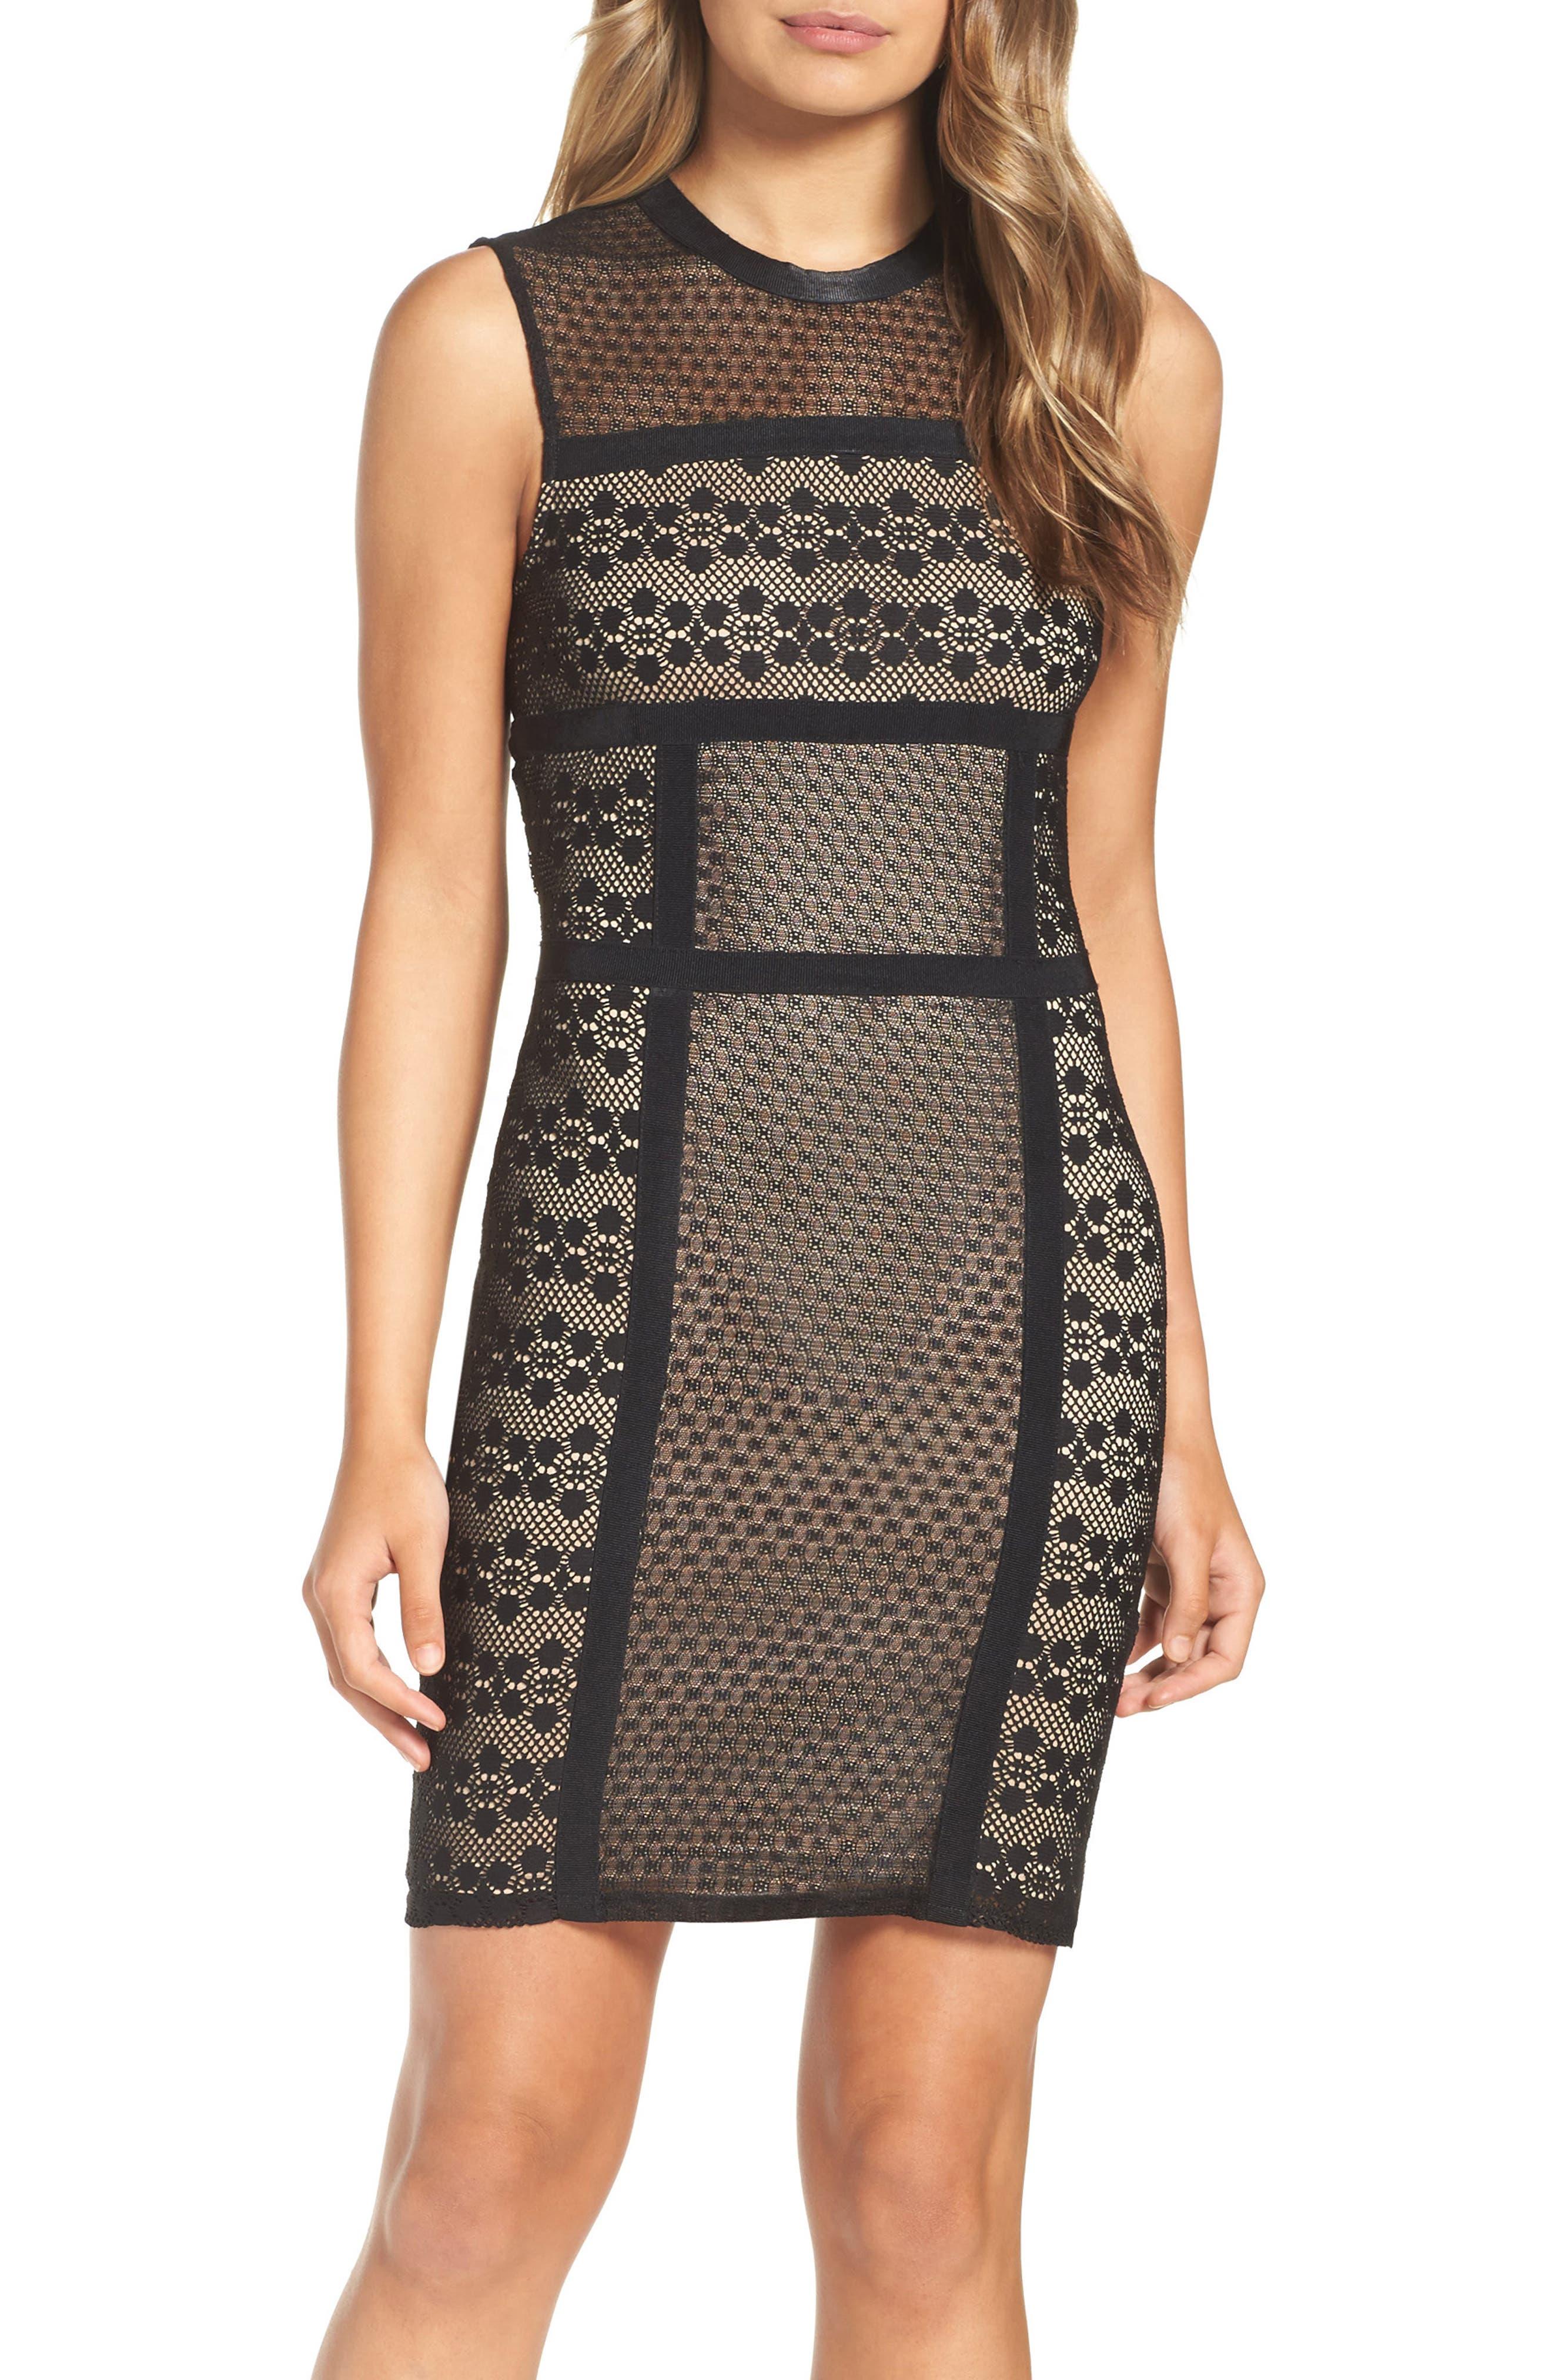 Hola Mamacita Body-Con Dress,                             Main thumbnail 1, color,                             Black